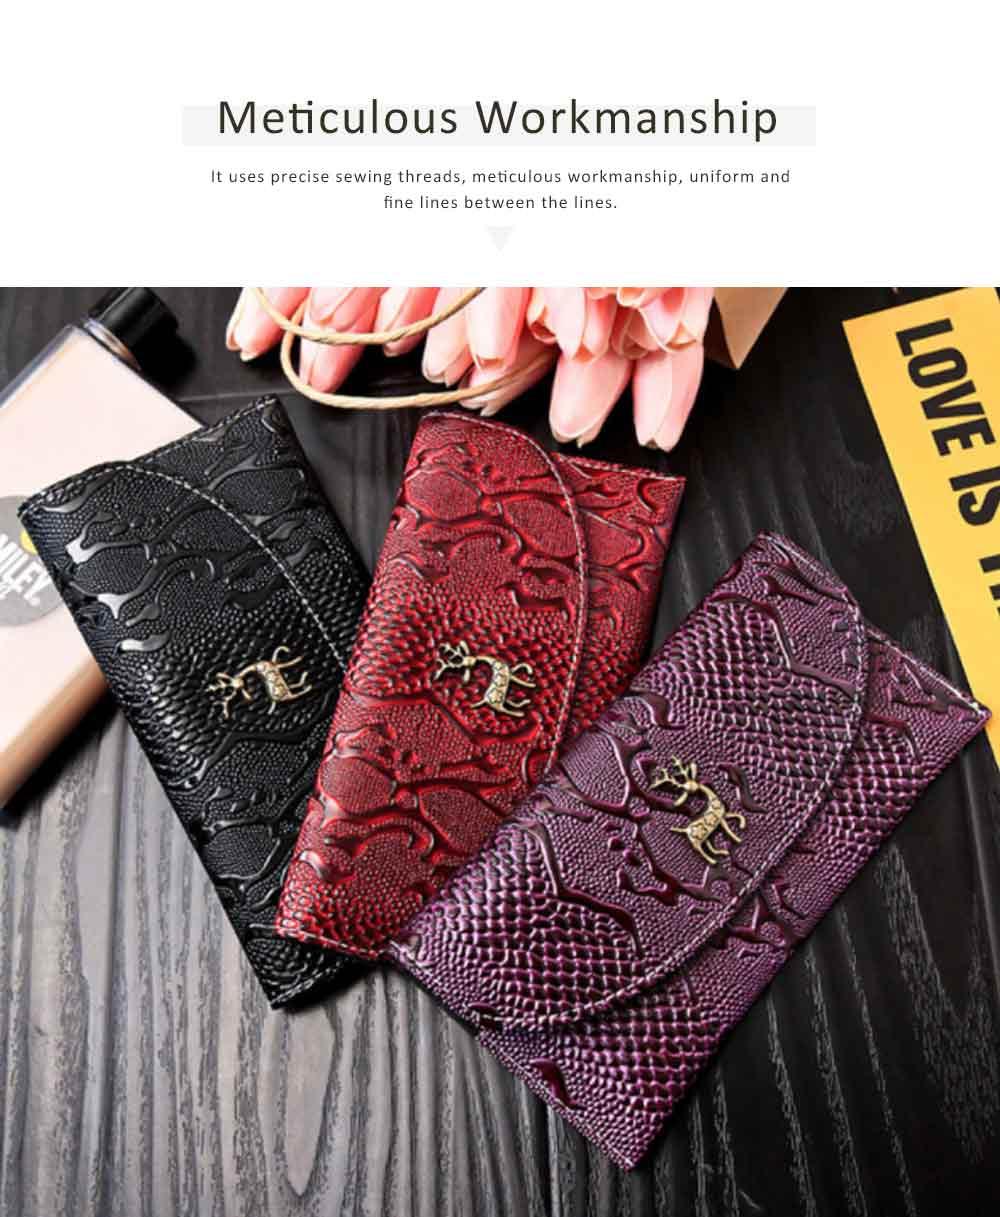 Snake Leather Purse, Sleek Minimalist Buckle Wallet For Ladies 8